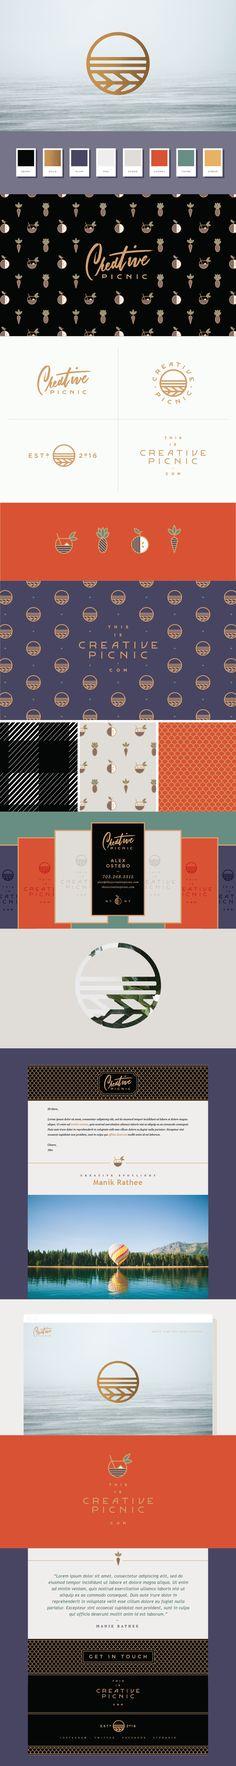 Creative picnic brand identity 800